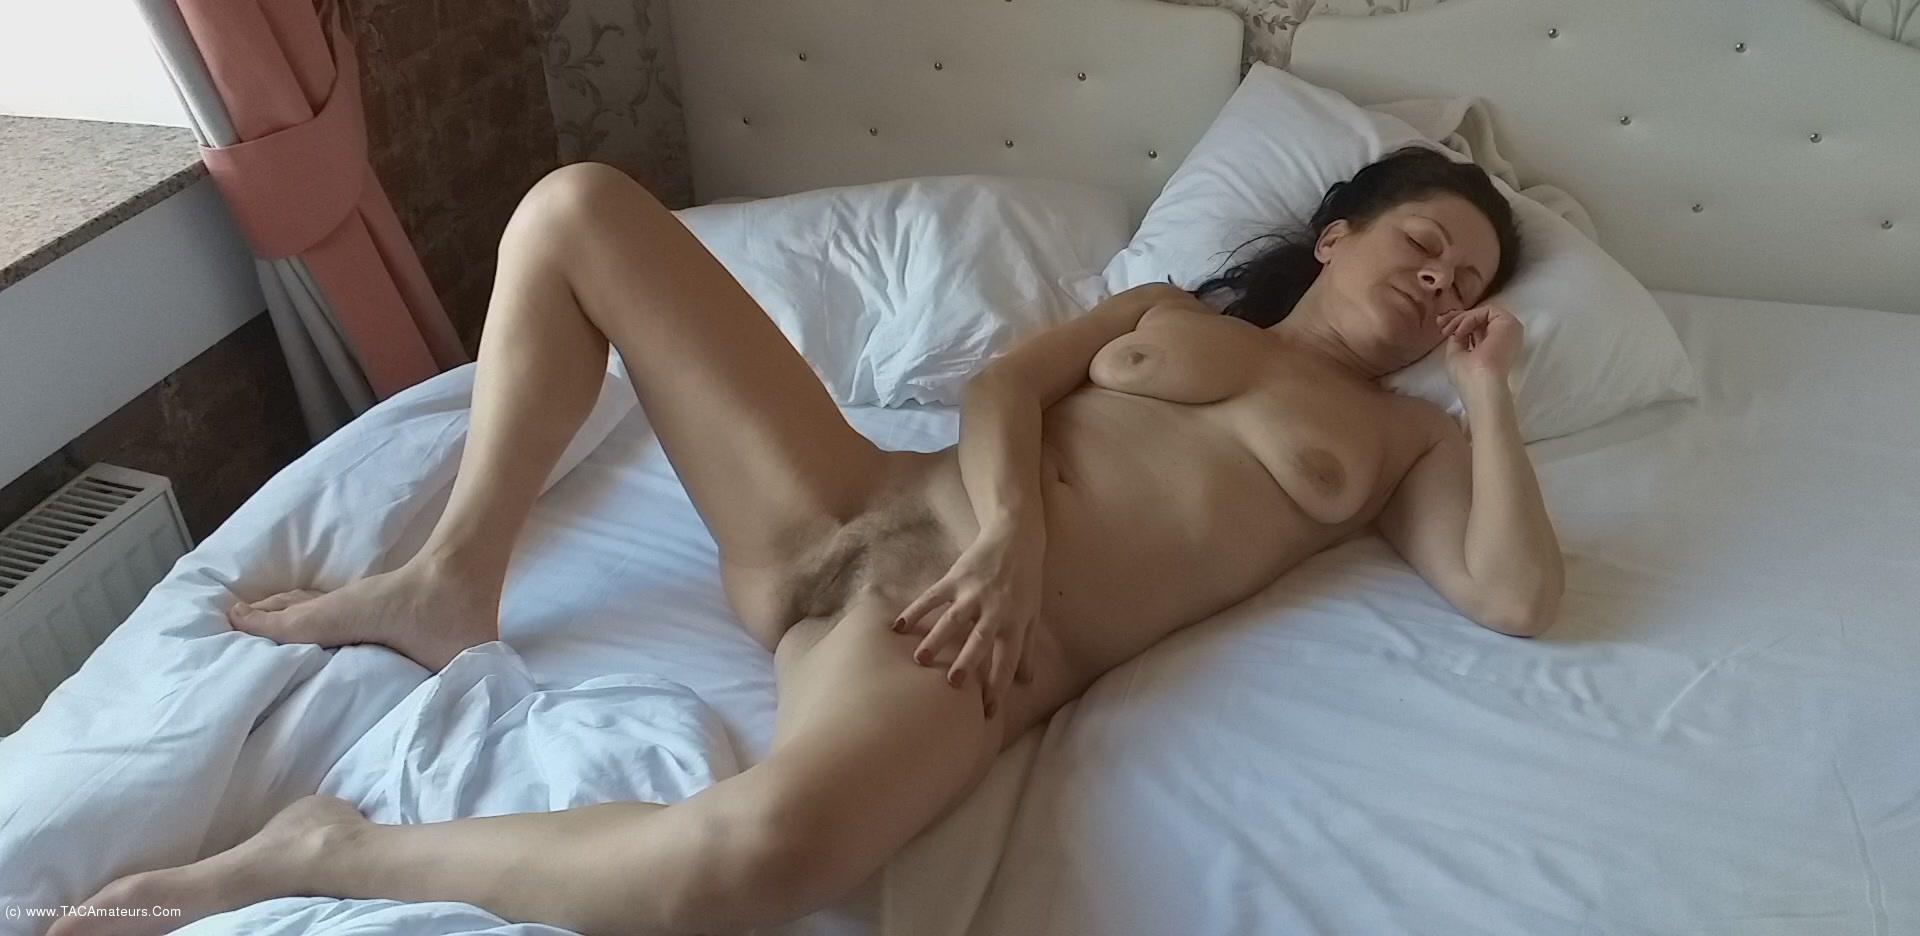 DianaAnanta - Morning Hotel scene 3